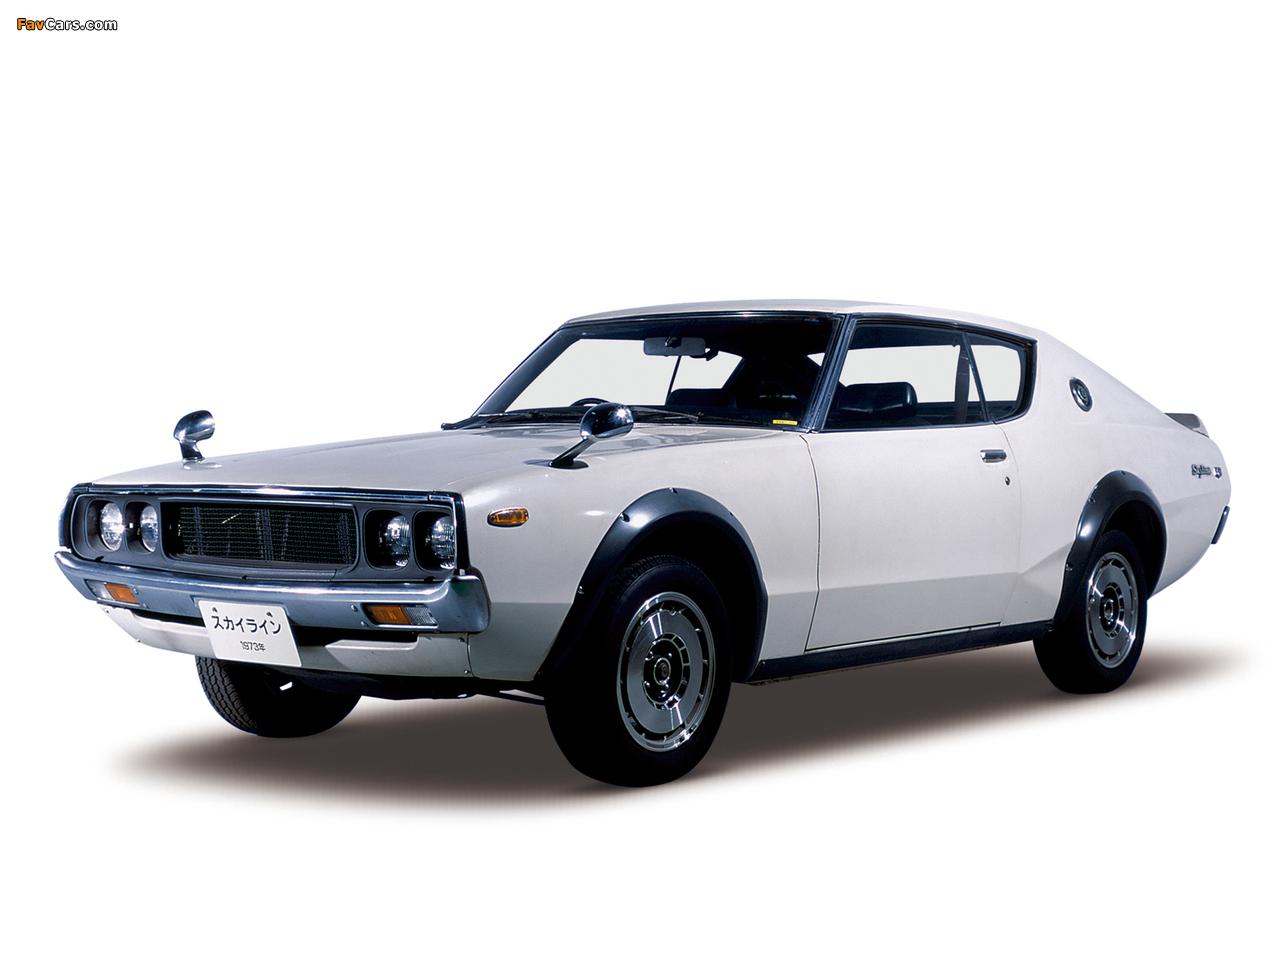 Nissan Skyline 2000GT-R (KPGC110) 1973 images (1280 x 960)